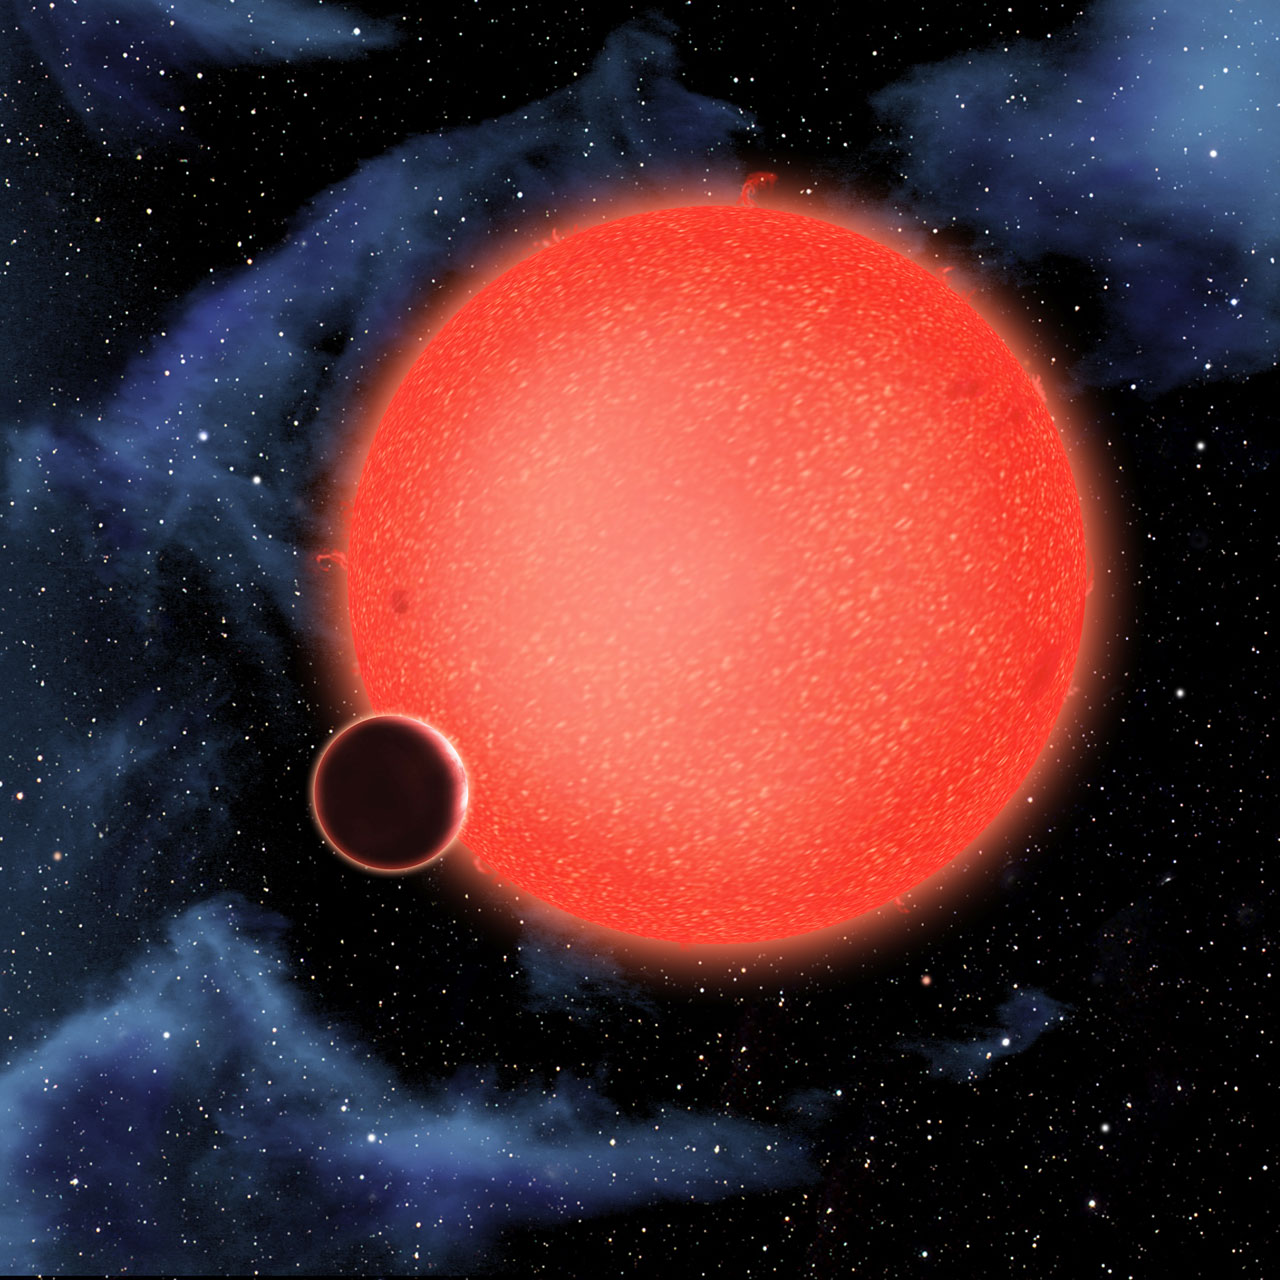 Hubble reveals a new class of extrasolar planet | ESA/Hubble